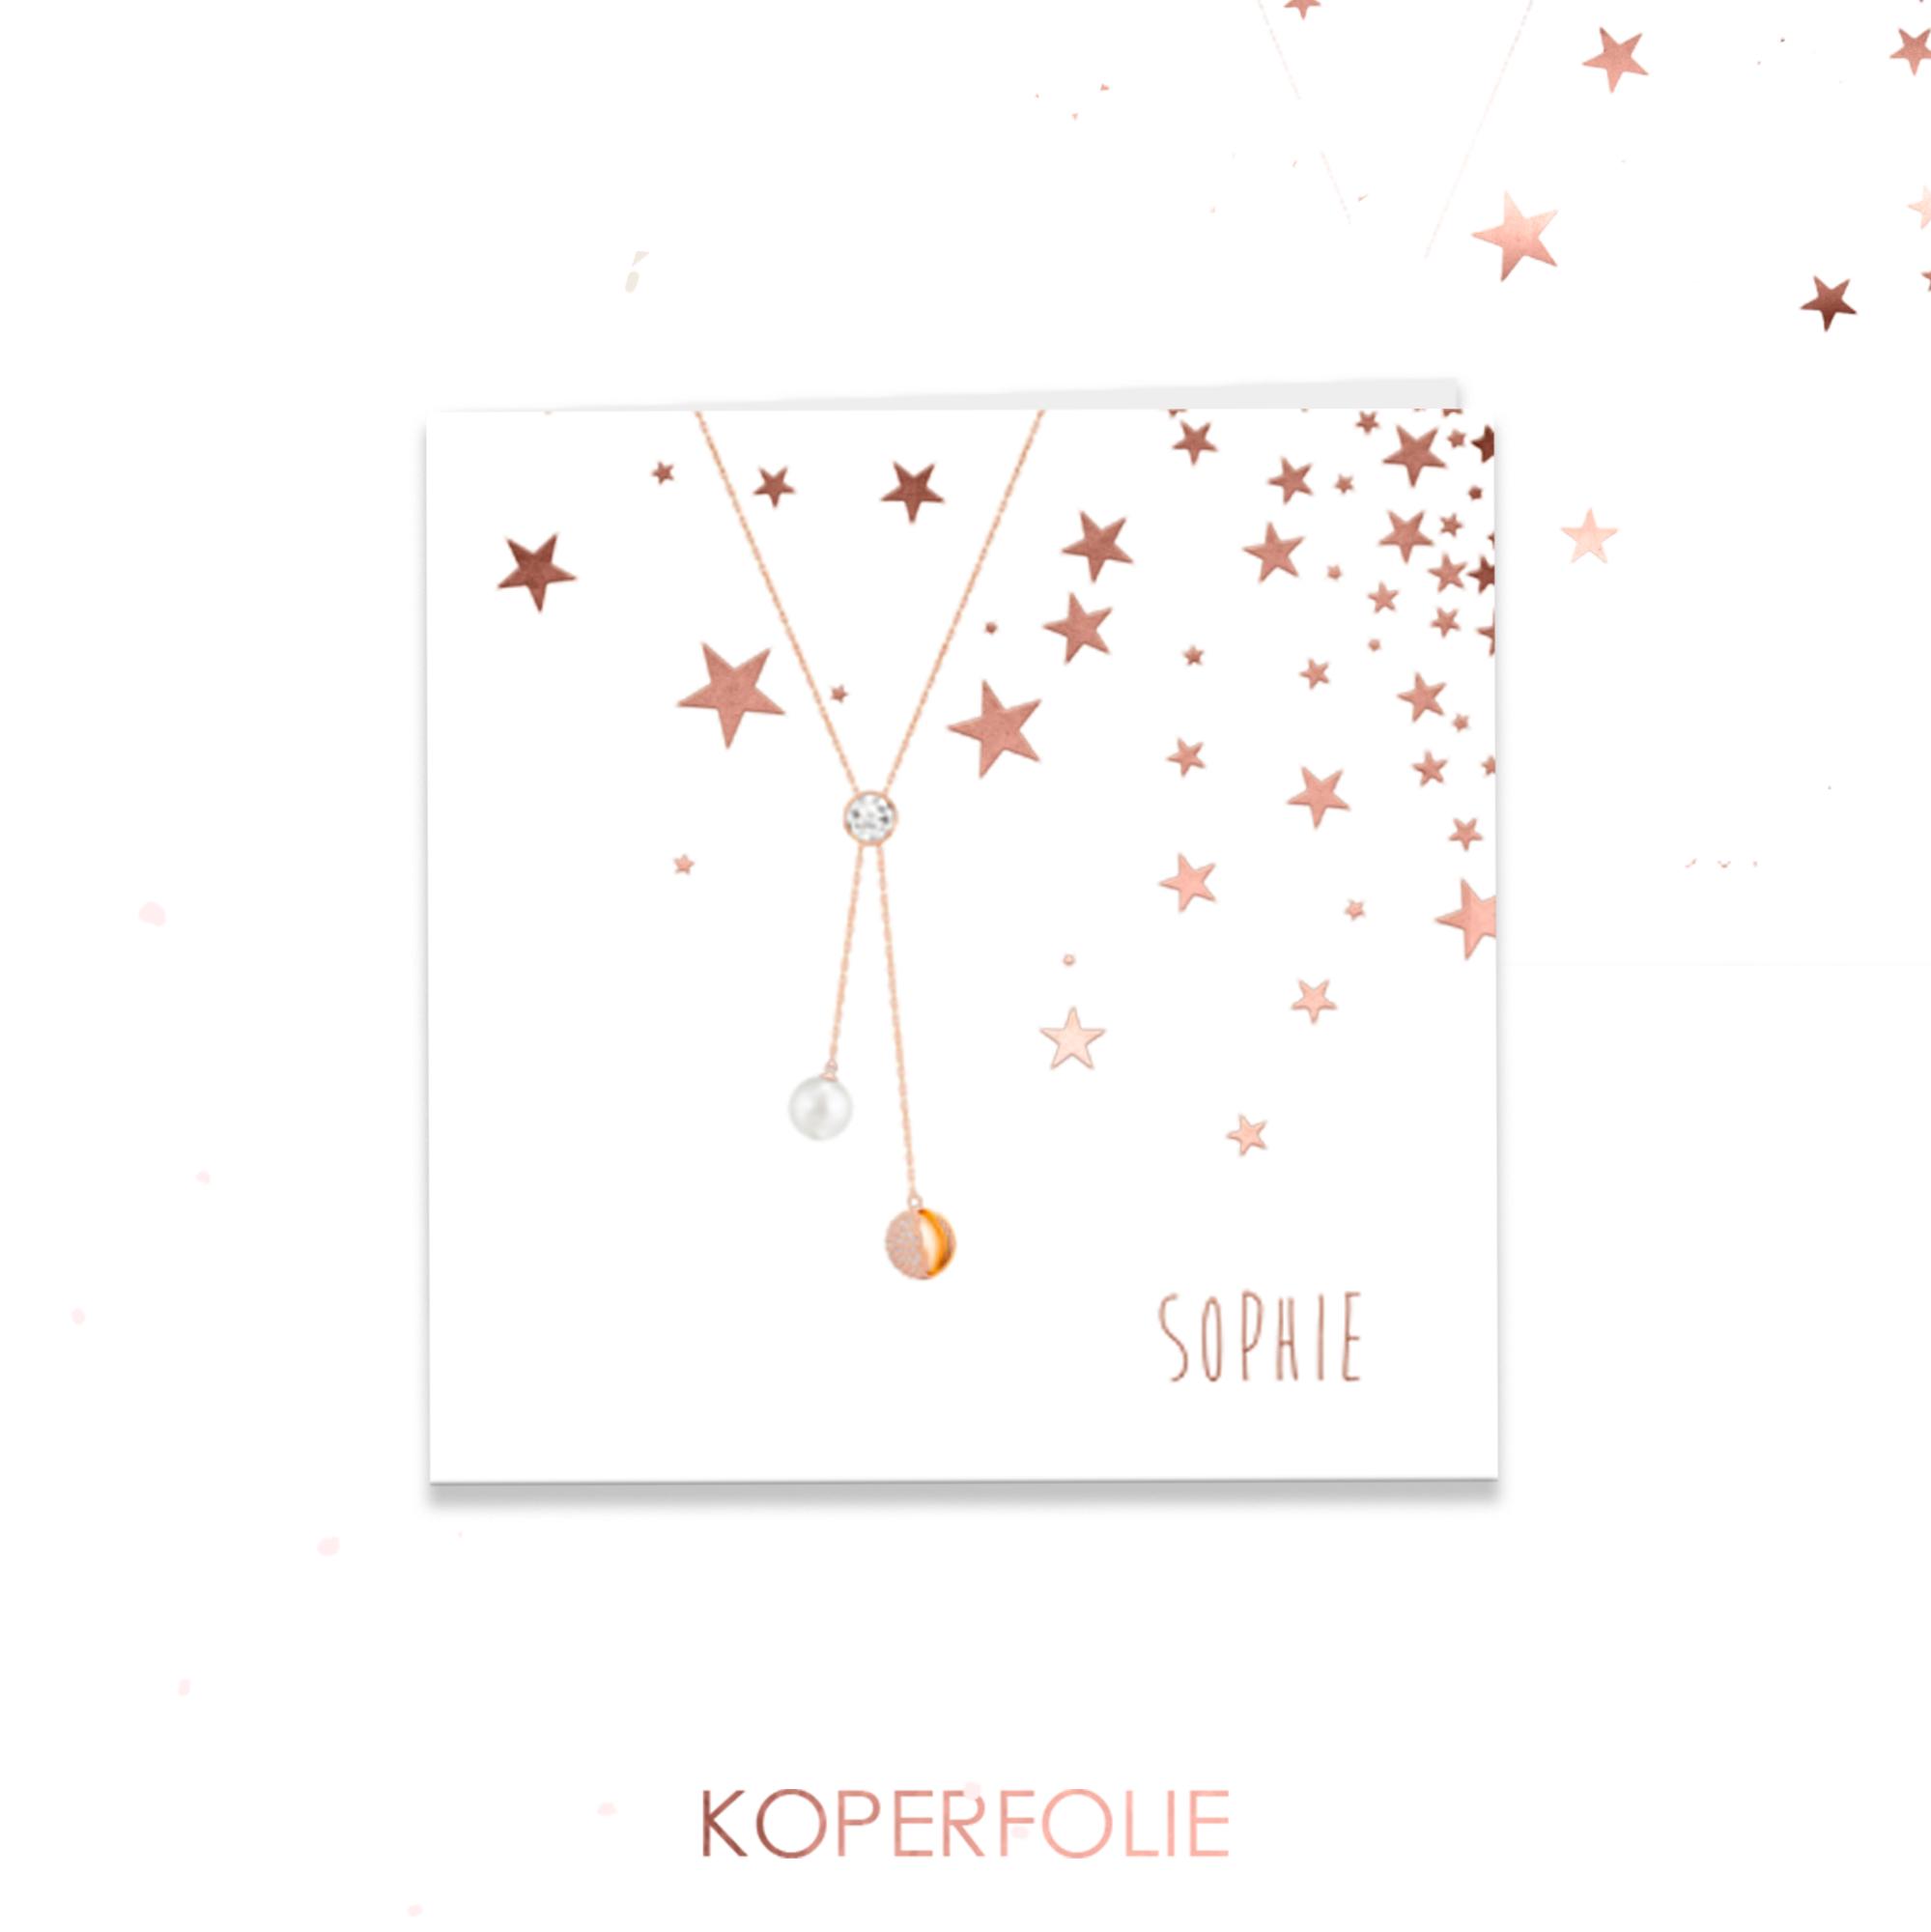 Koperfolie geboortekaartje met ketting en sterren